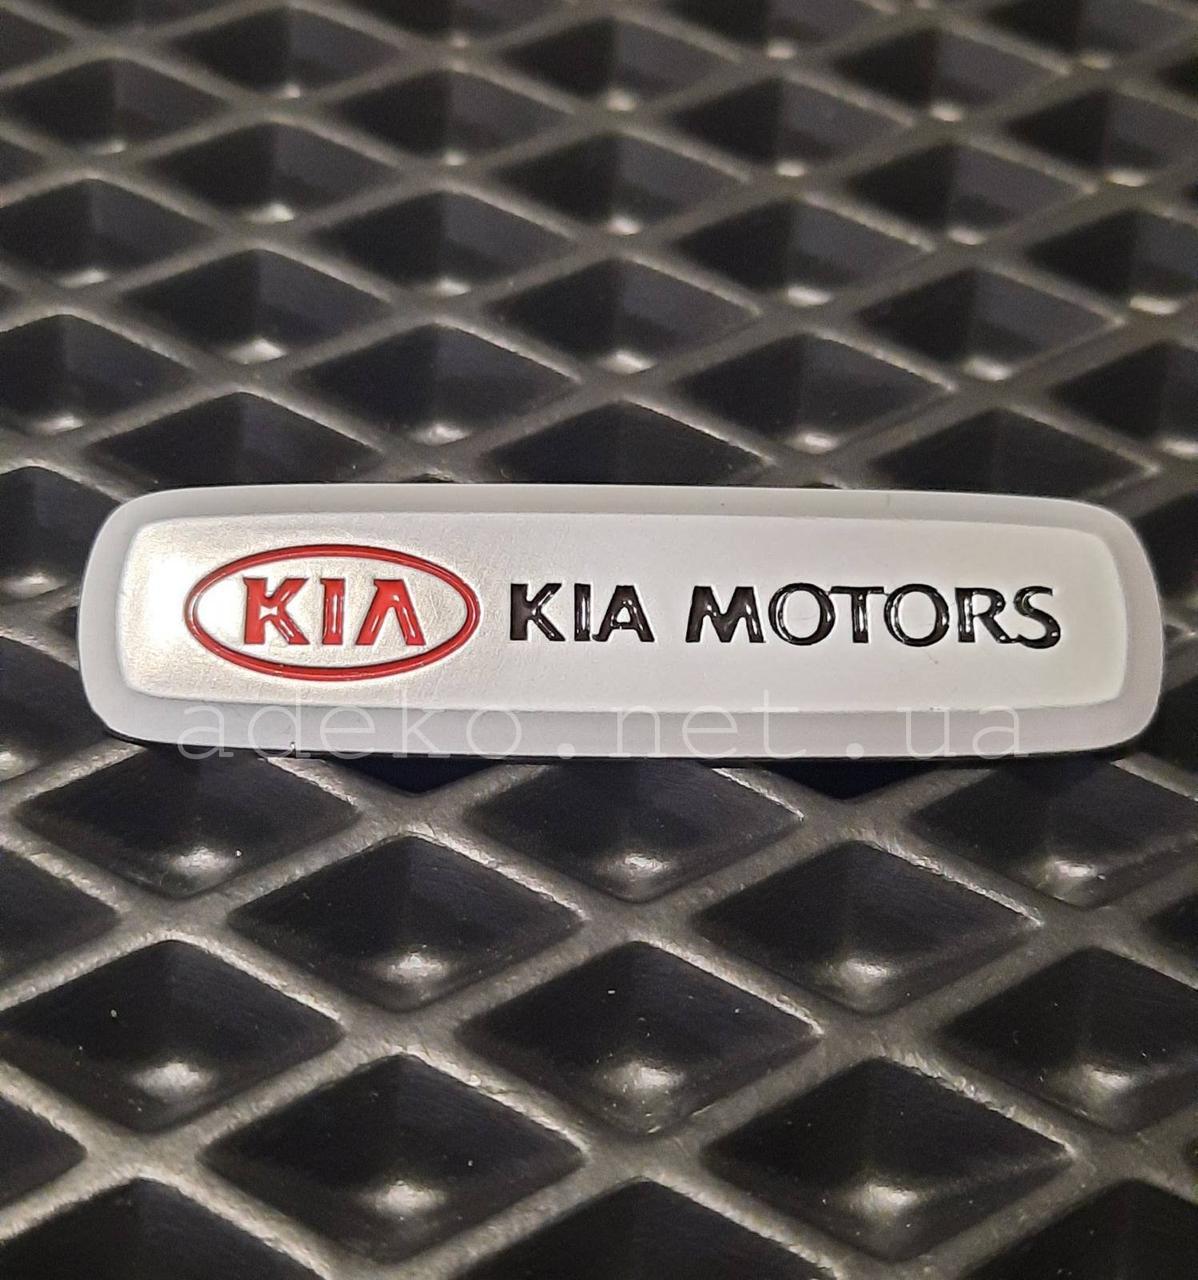 Авто эмблема Kia Motors для ковриков эва